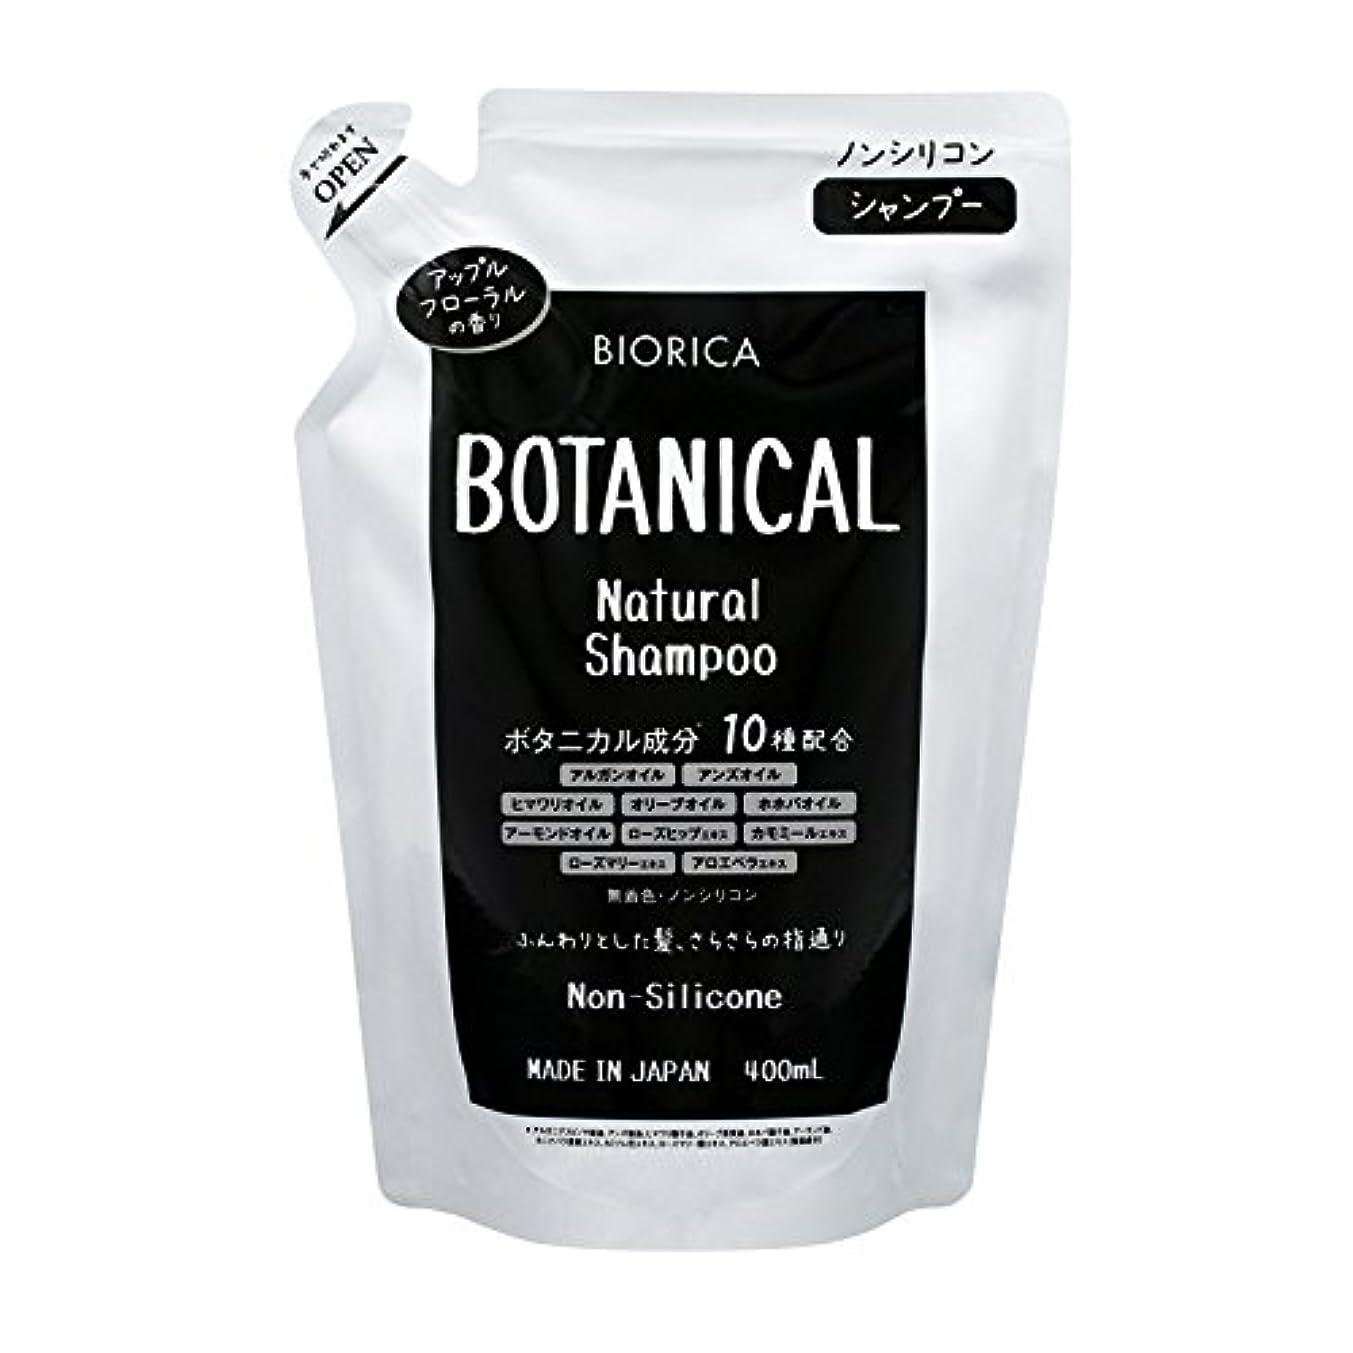 BIORICA ビオリカ ボタニカル ノンシリコン シャンプー 詰め替え アップルフローラルの香り 400ml 日本製